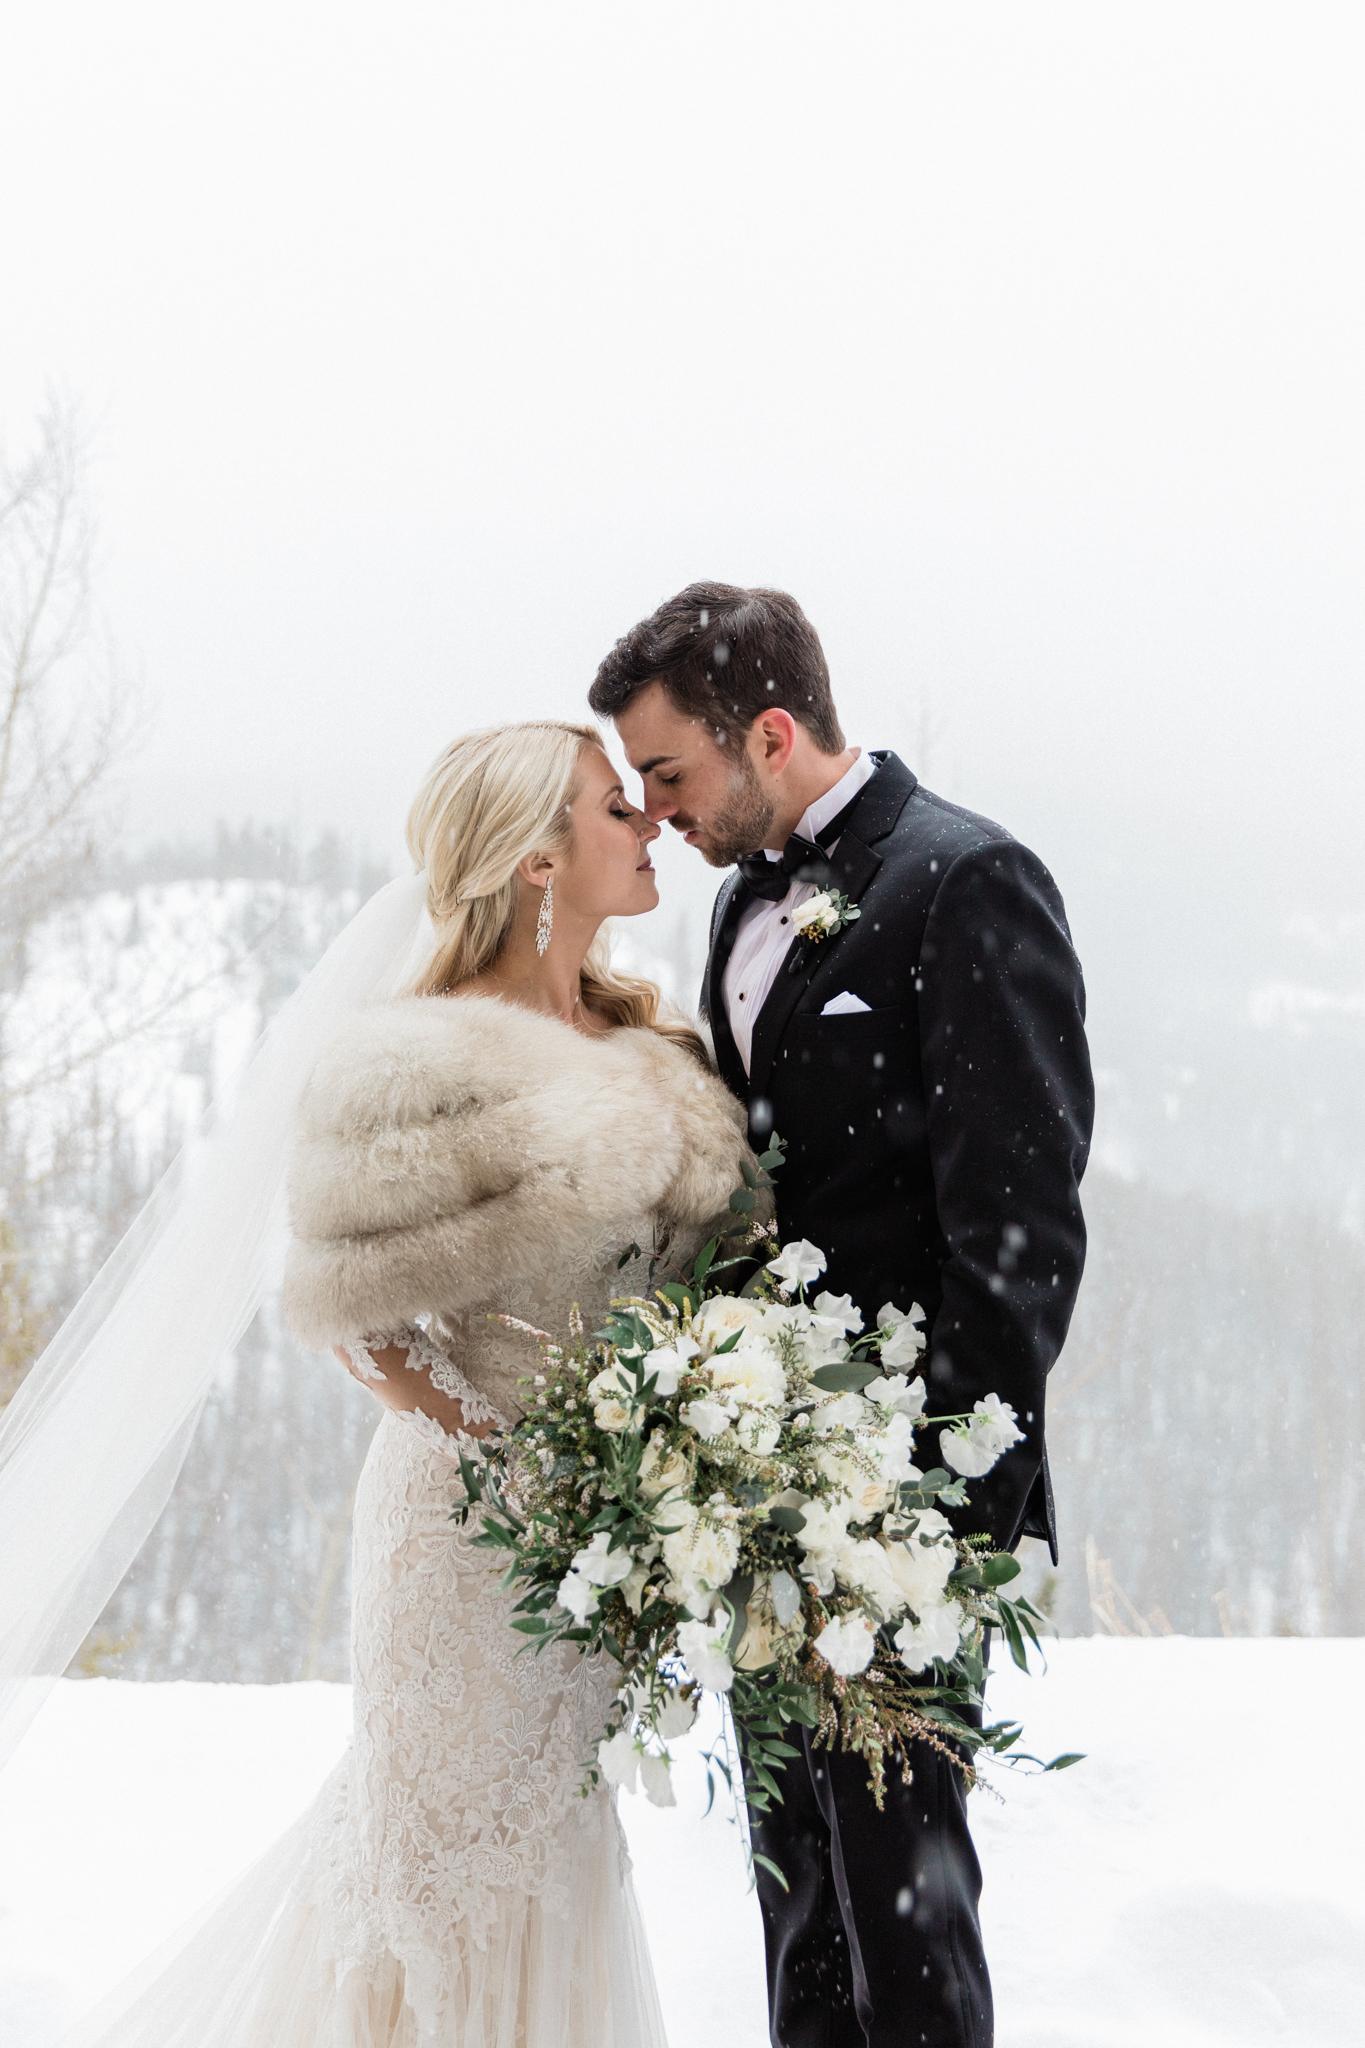 The Lodge at Breckenridge Winter Wedding